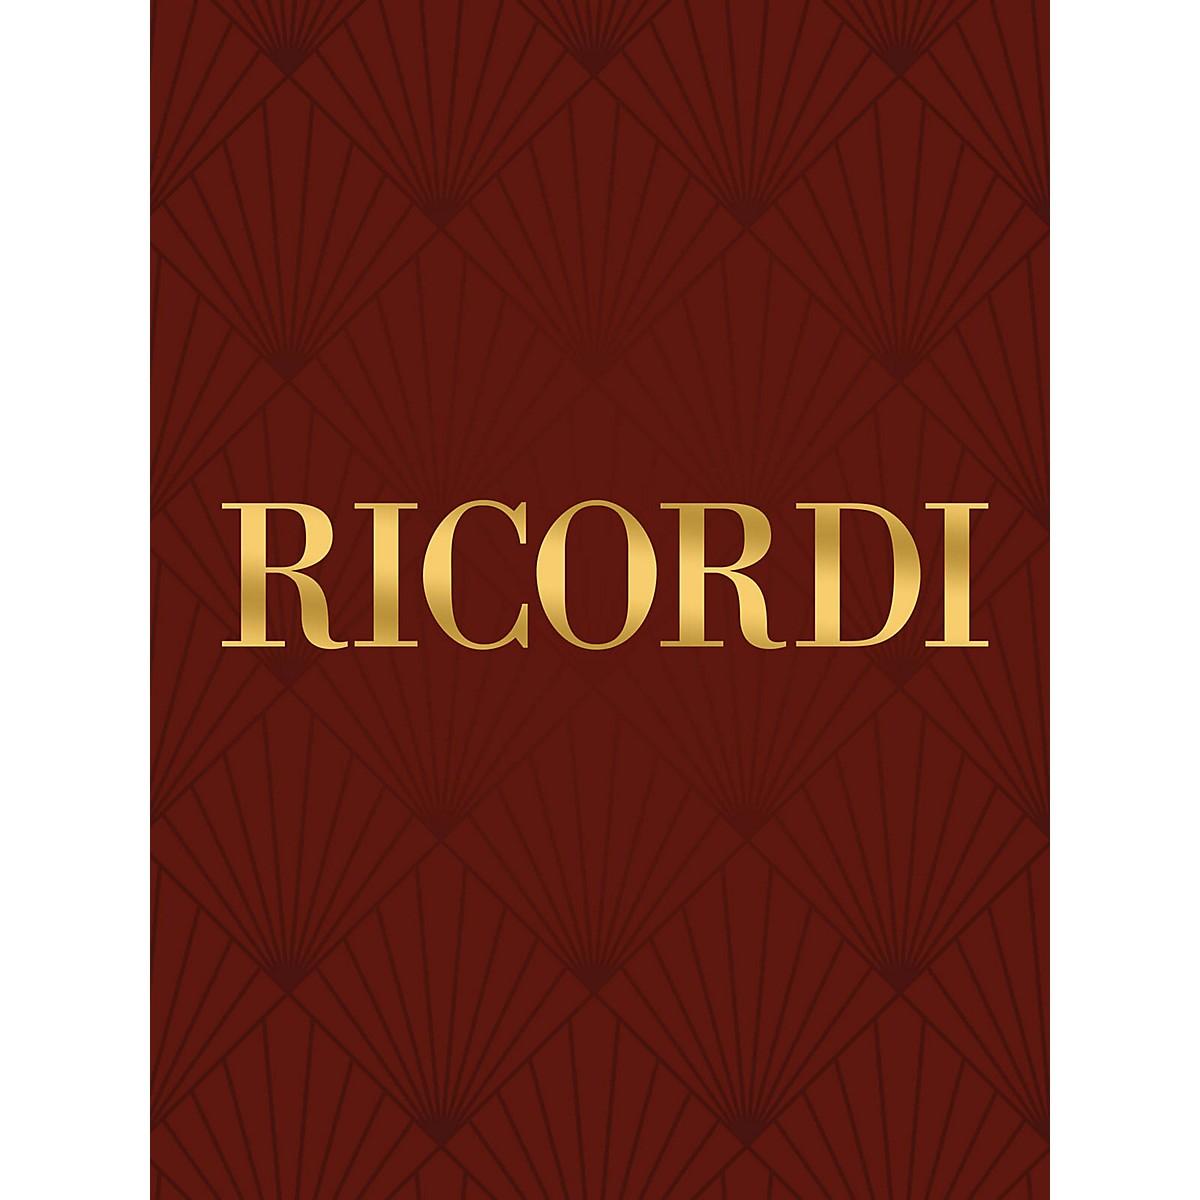 Ricordi Gradus Ad Parnassum Volume 2 Piano Large Works Series Composed by Muzio Clementi Edited by Cesi-Marciano